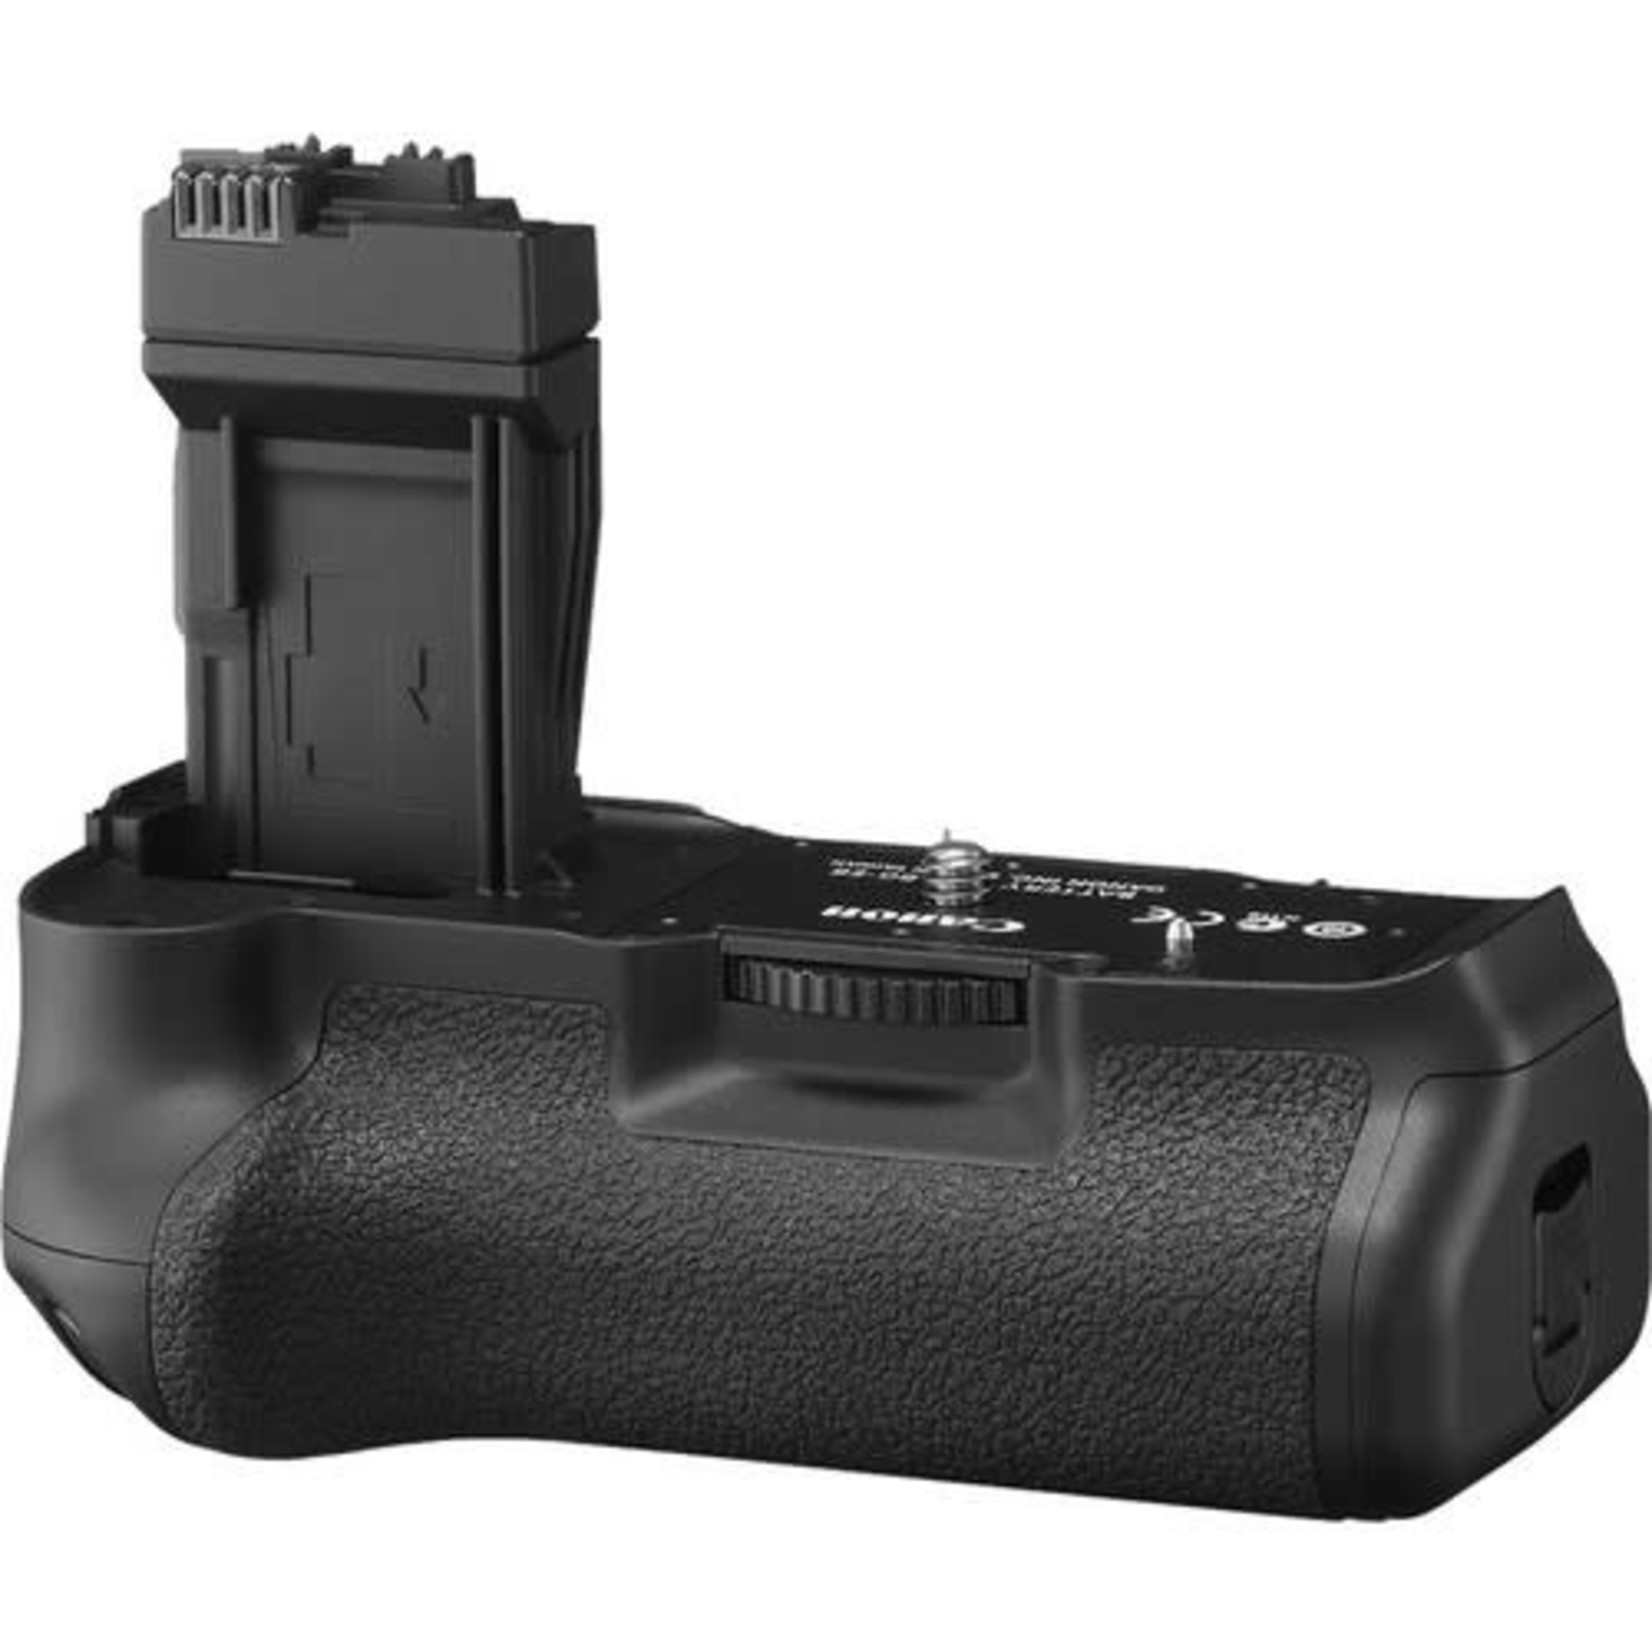 Canon Canon BG-E8 Battery Grip for EOS Rebel T2i, T3i, T4i & T5i